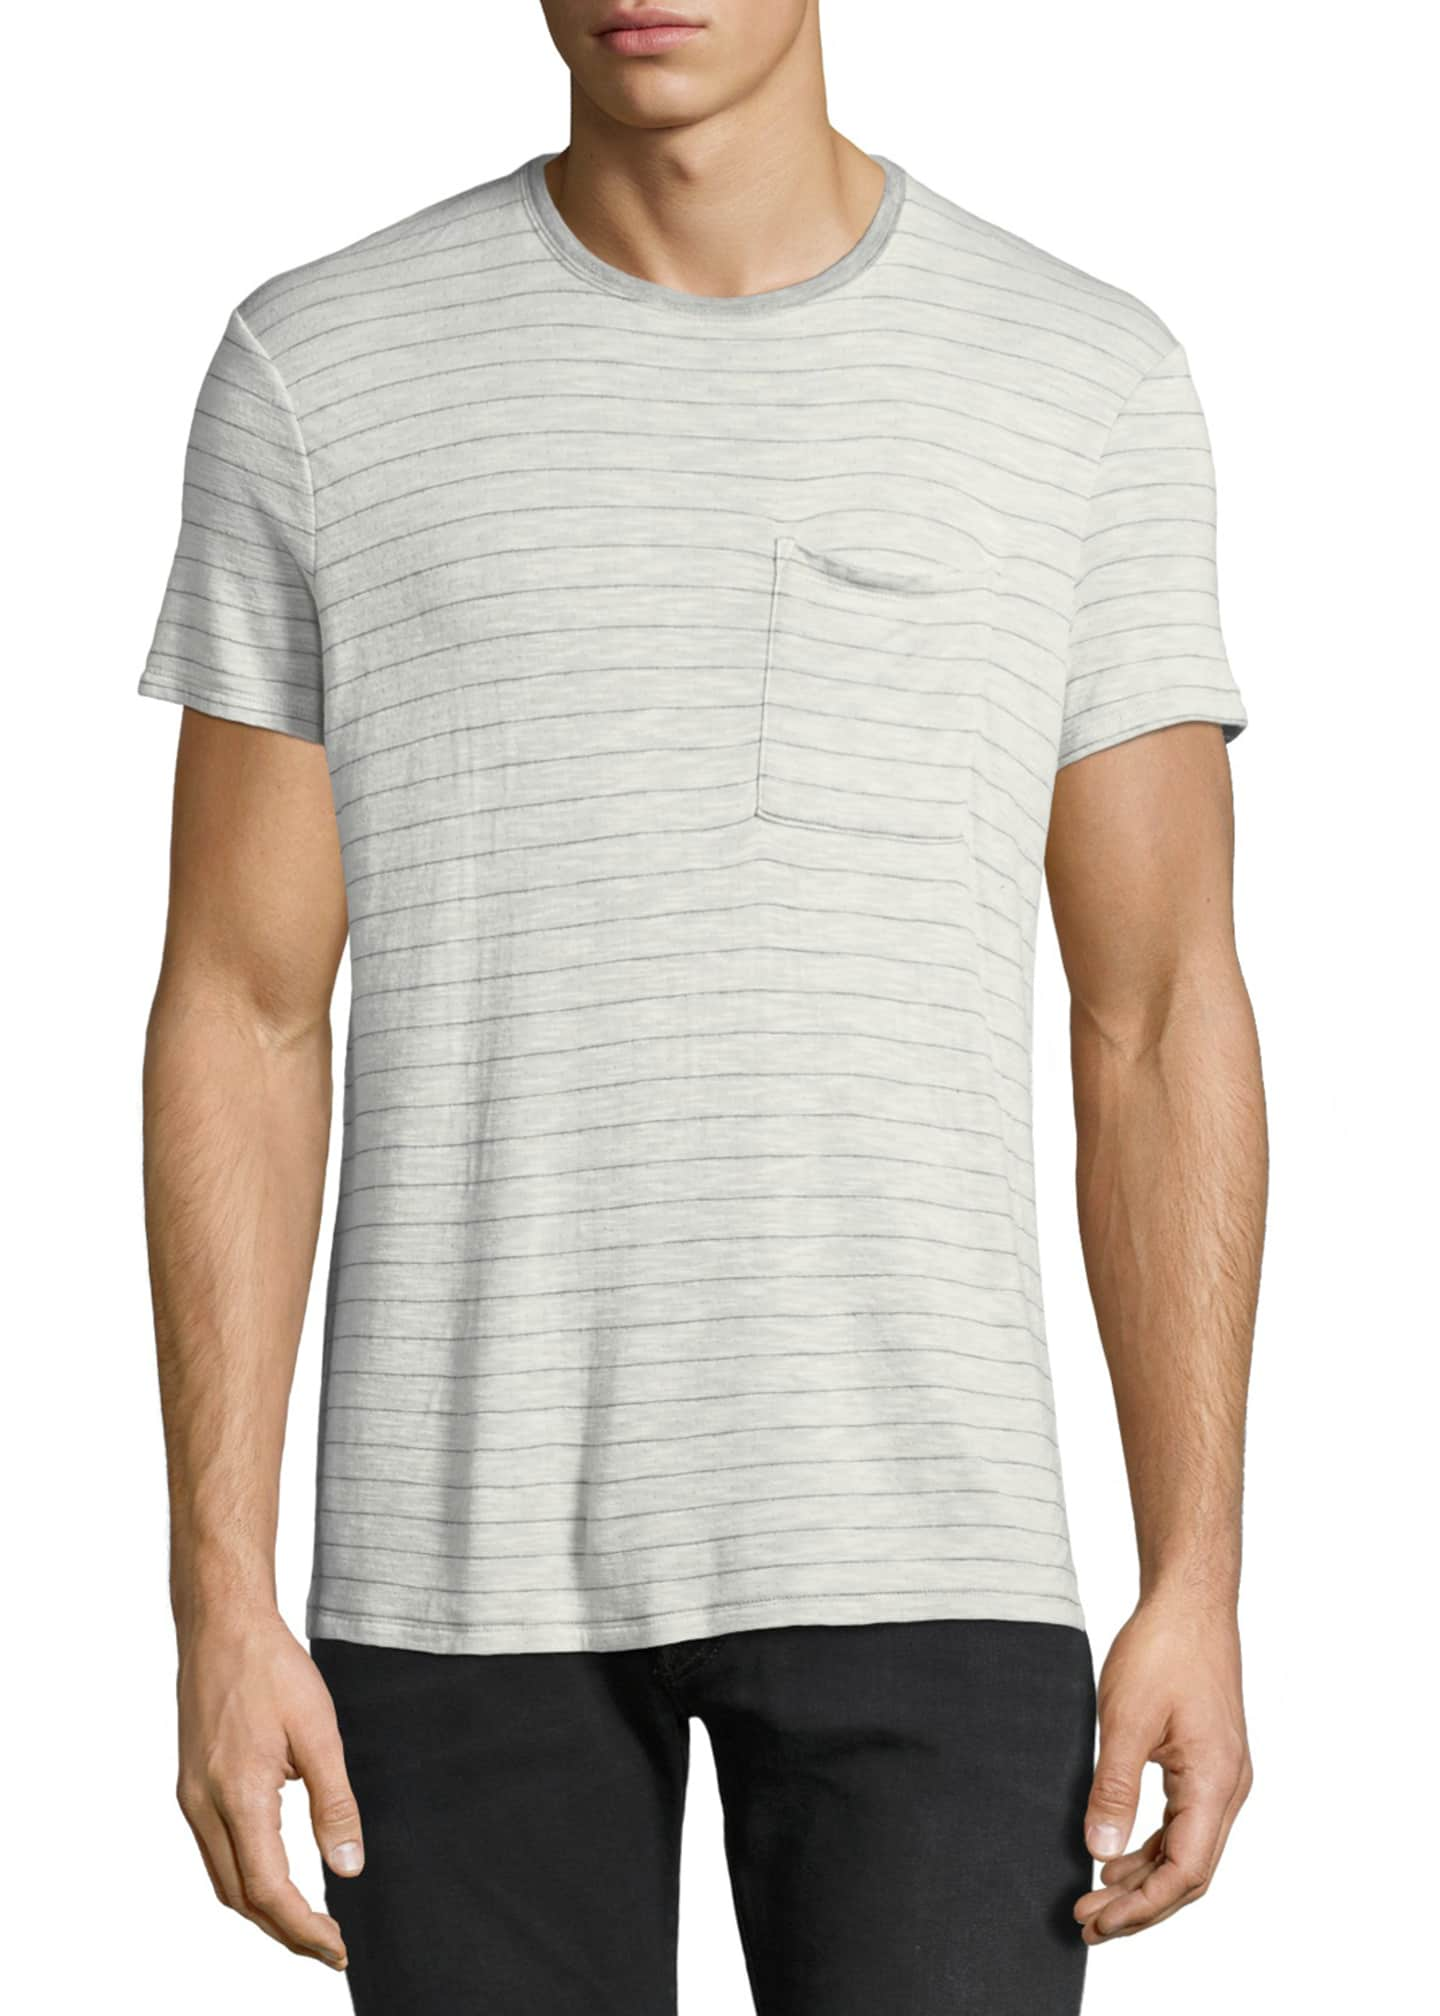 ATM Anthony Thomas Melillo Men's Striped Slub T-Shirt